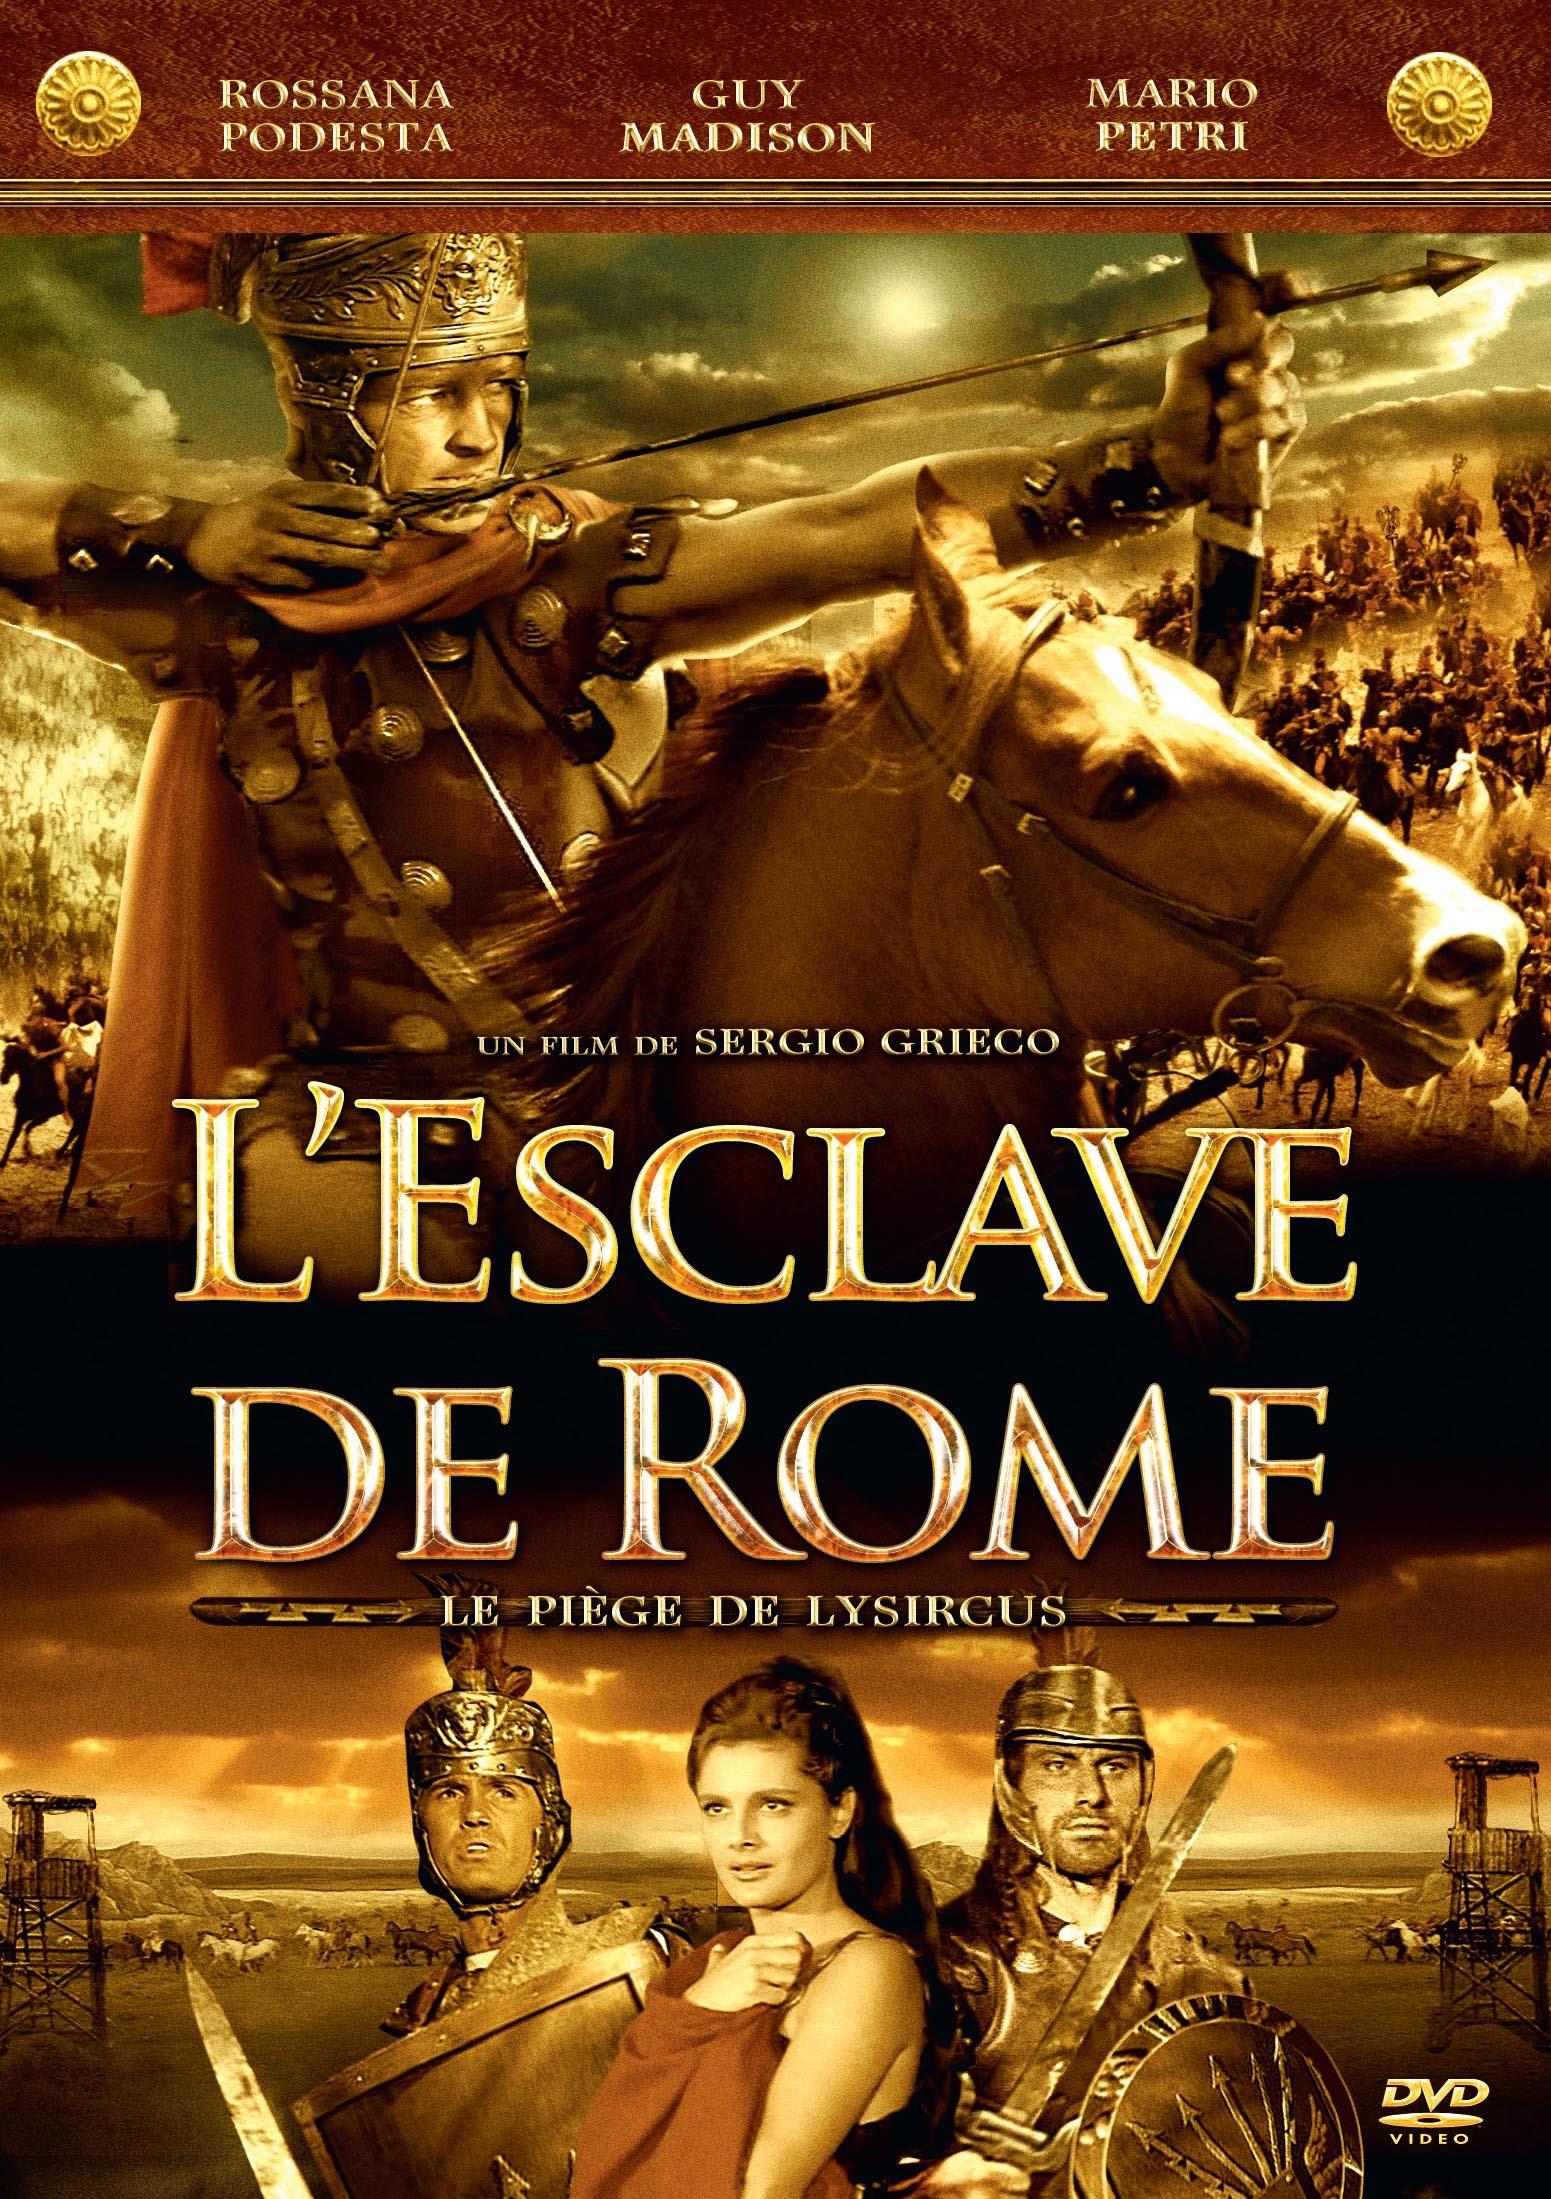 Esclave de rome (l') - dvd